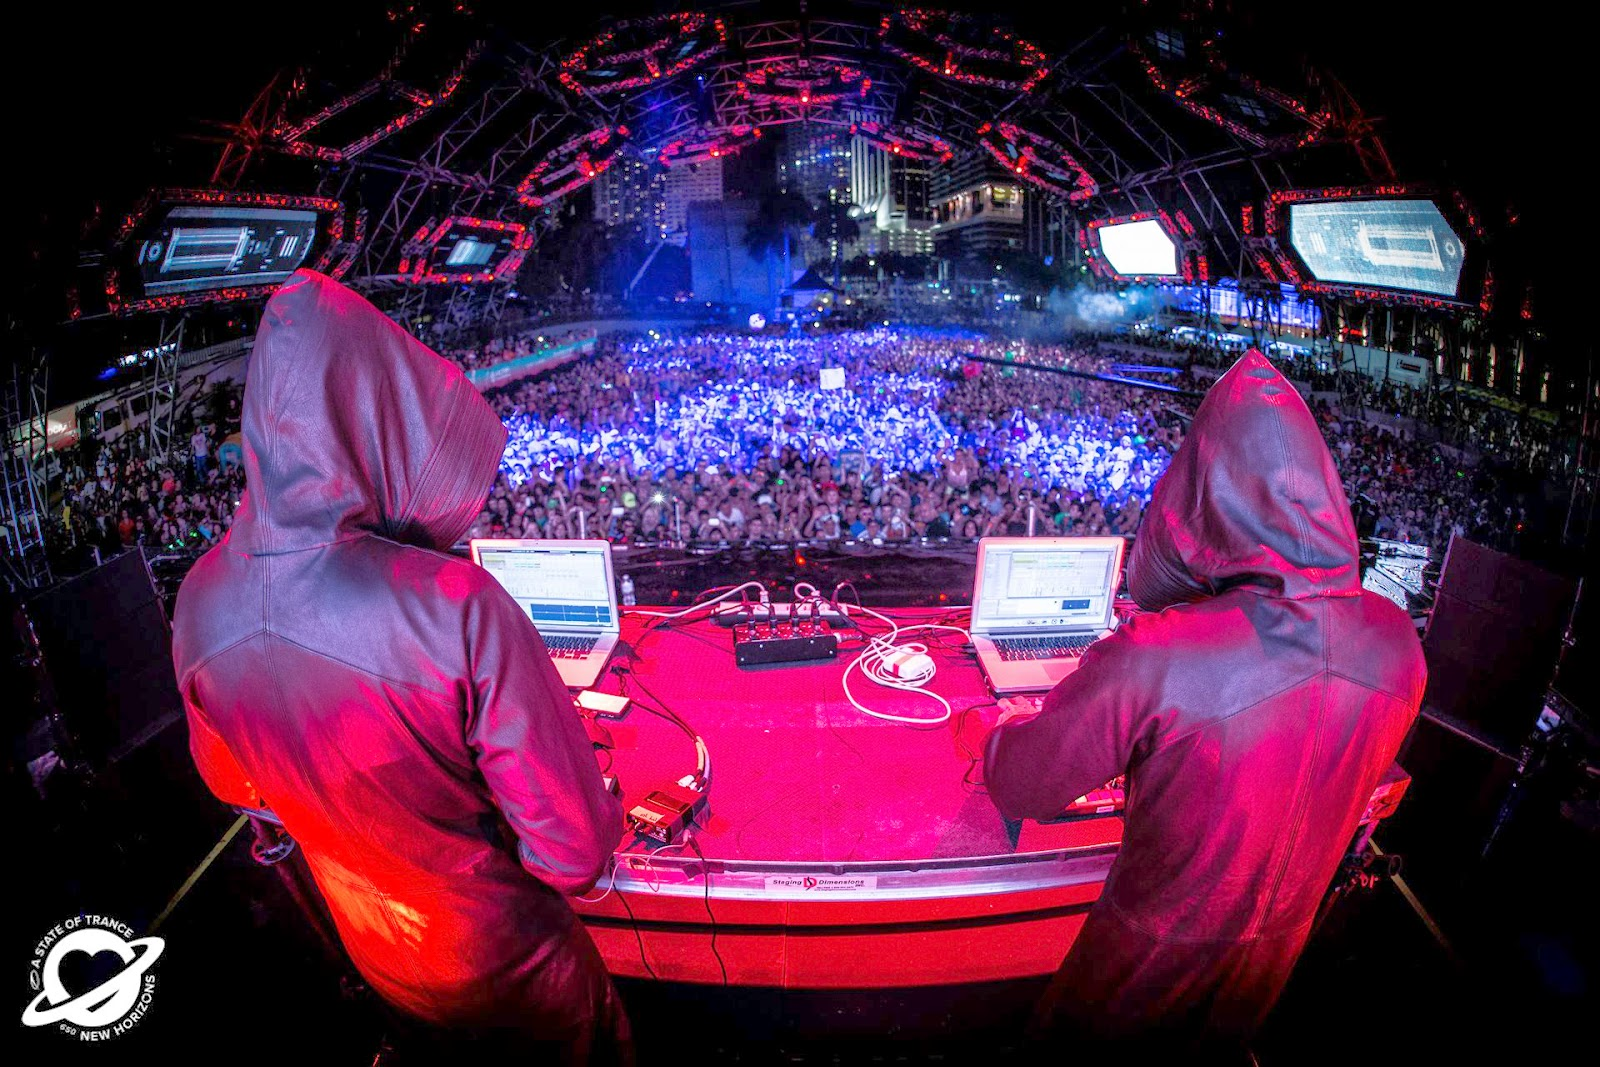 Gaia-ASOT-650-at-Ultra-Music-Festival-2014-DJ-Set-.jpg